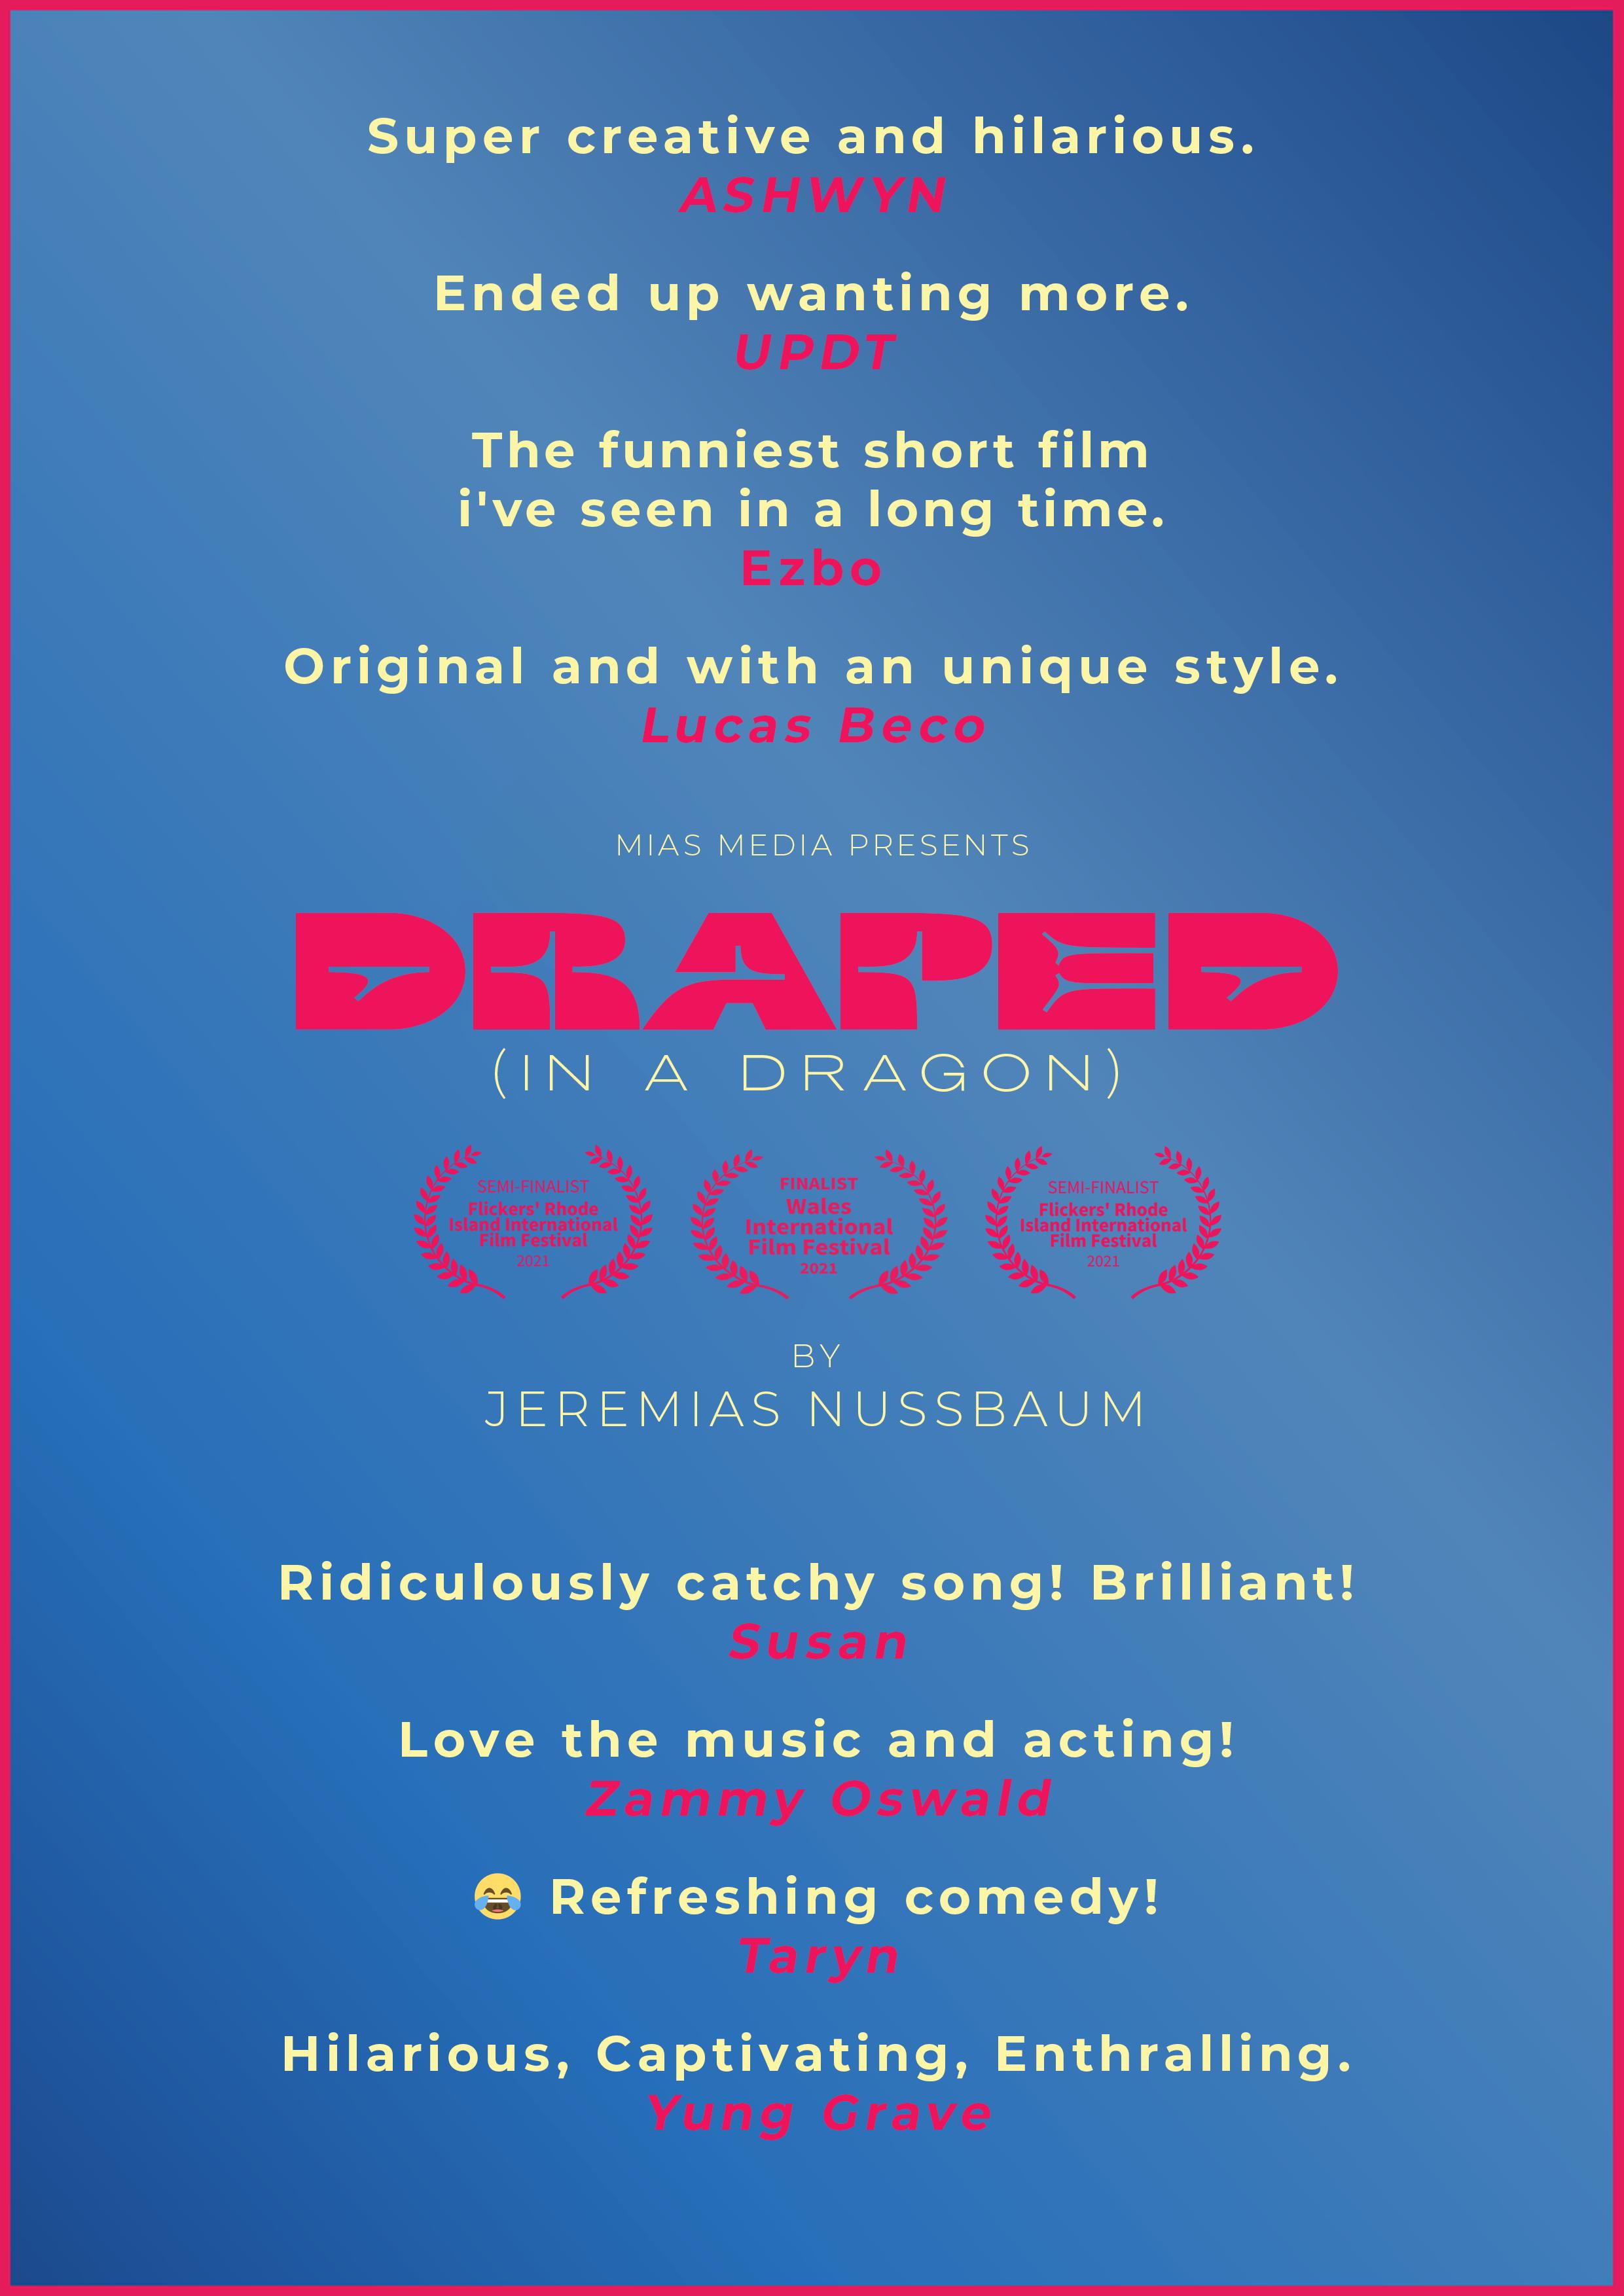 Draped (In A Dragon)